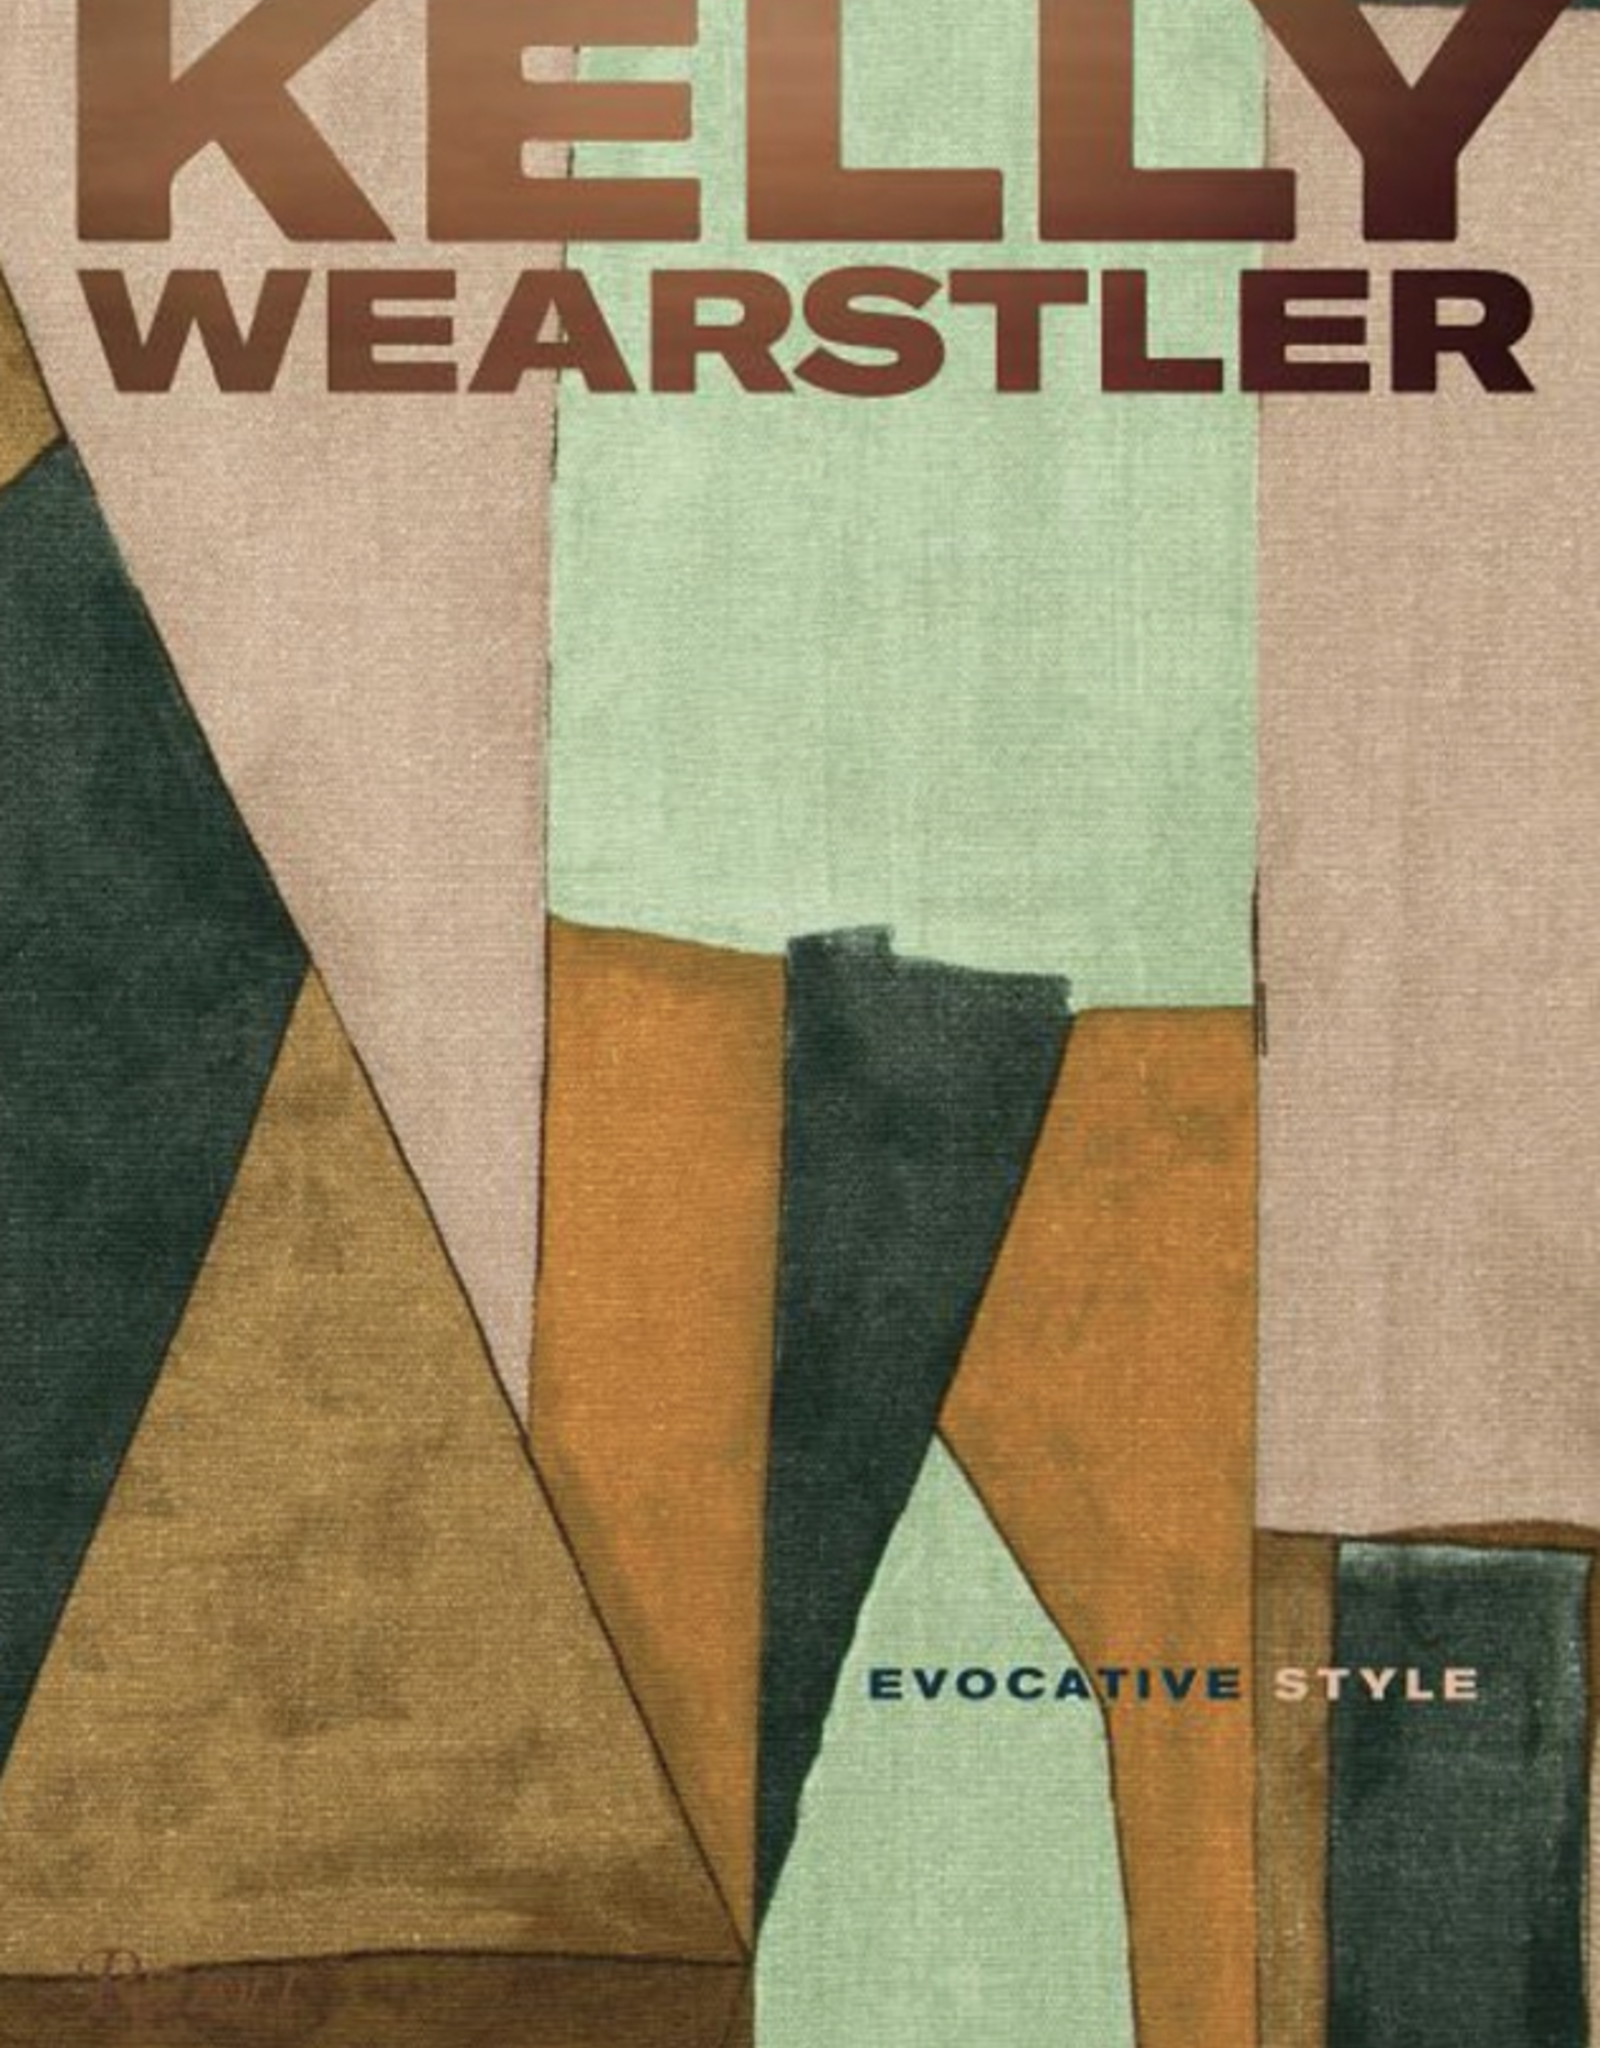 Website Kelly Wearstler : Evocative Style